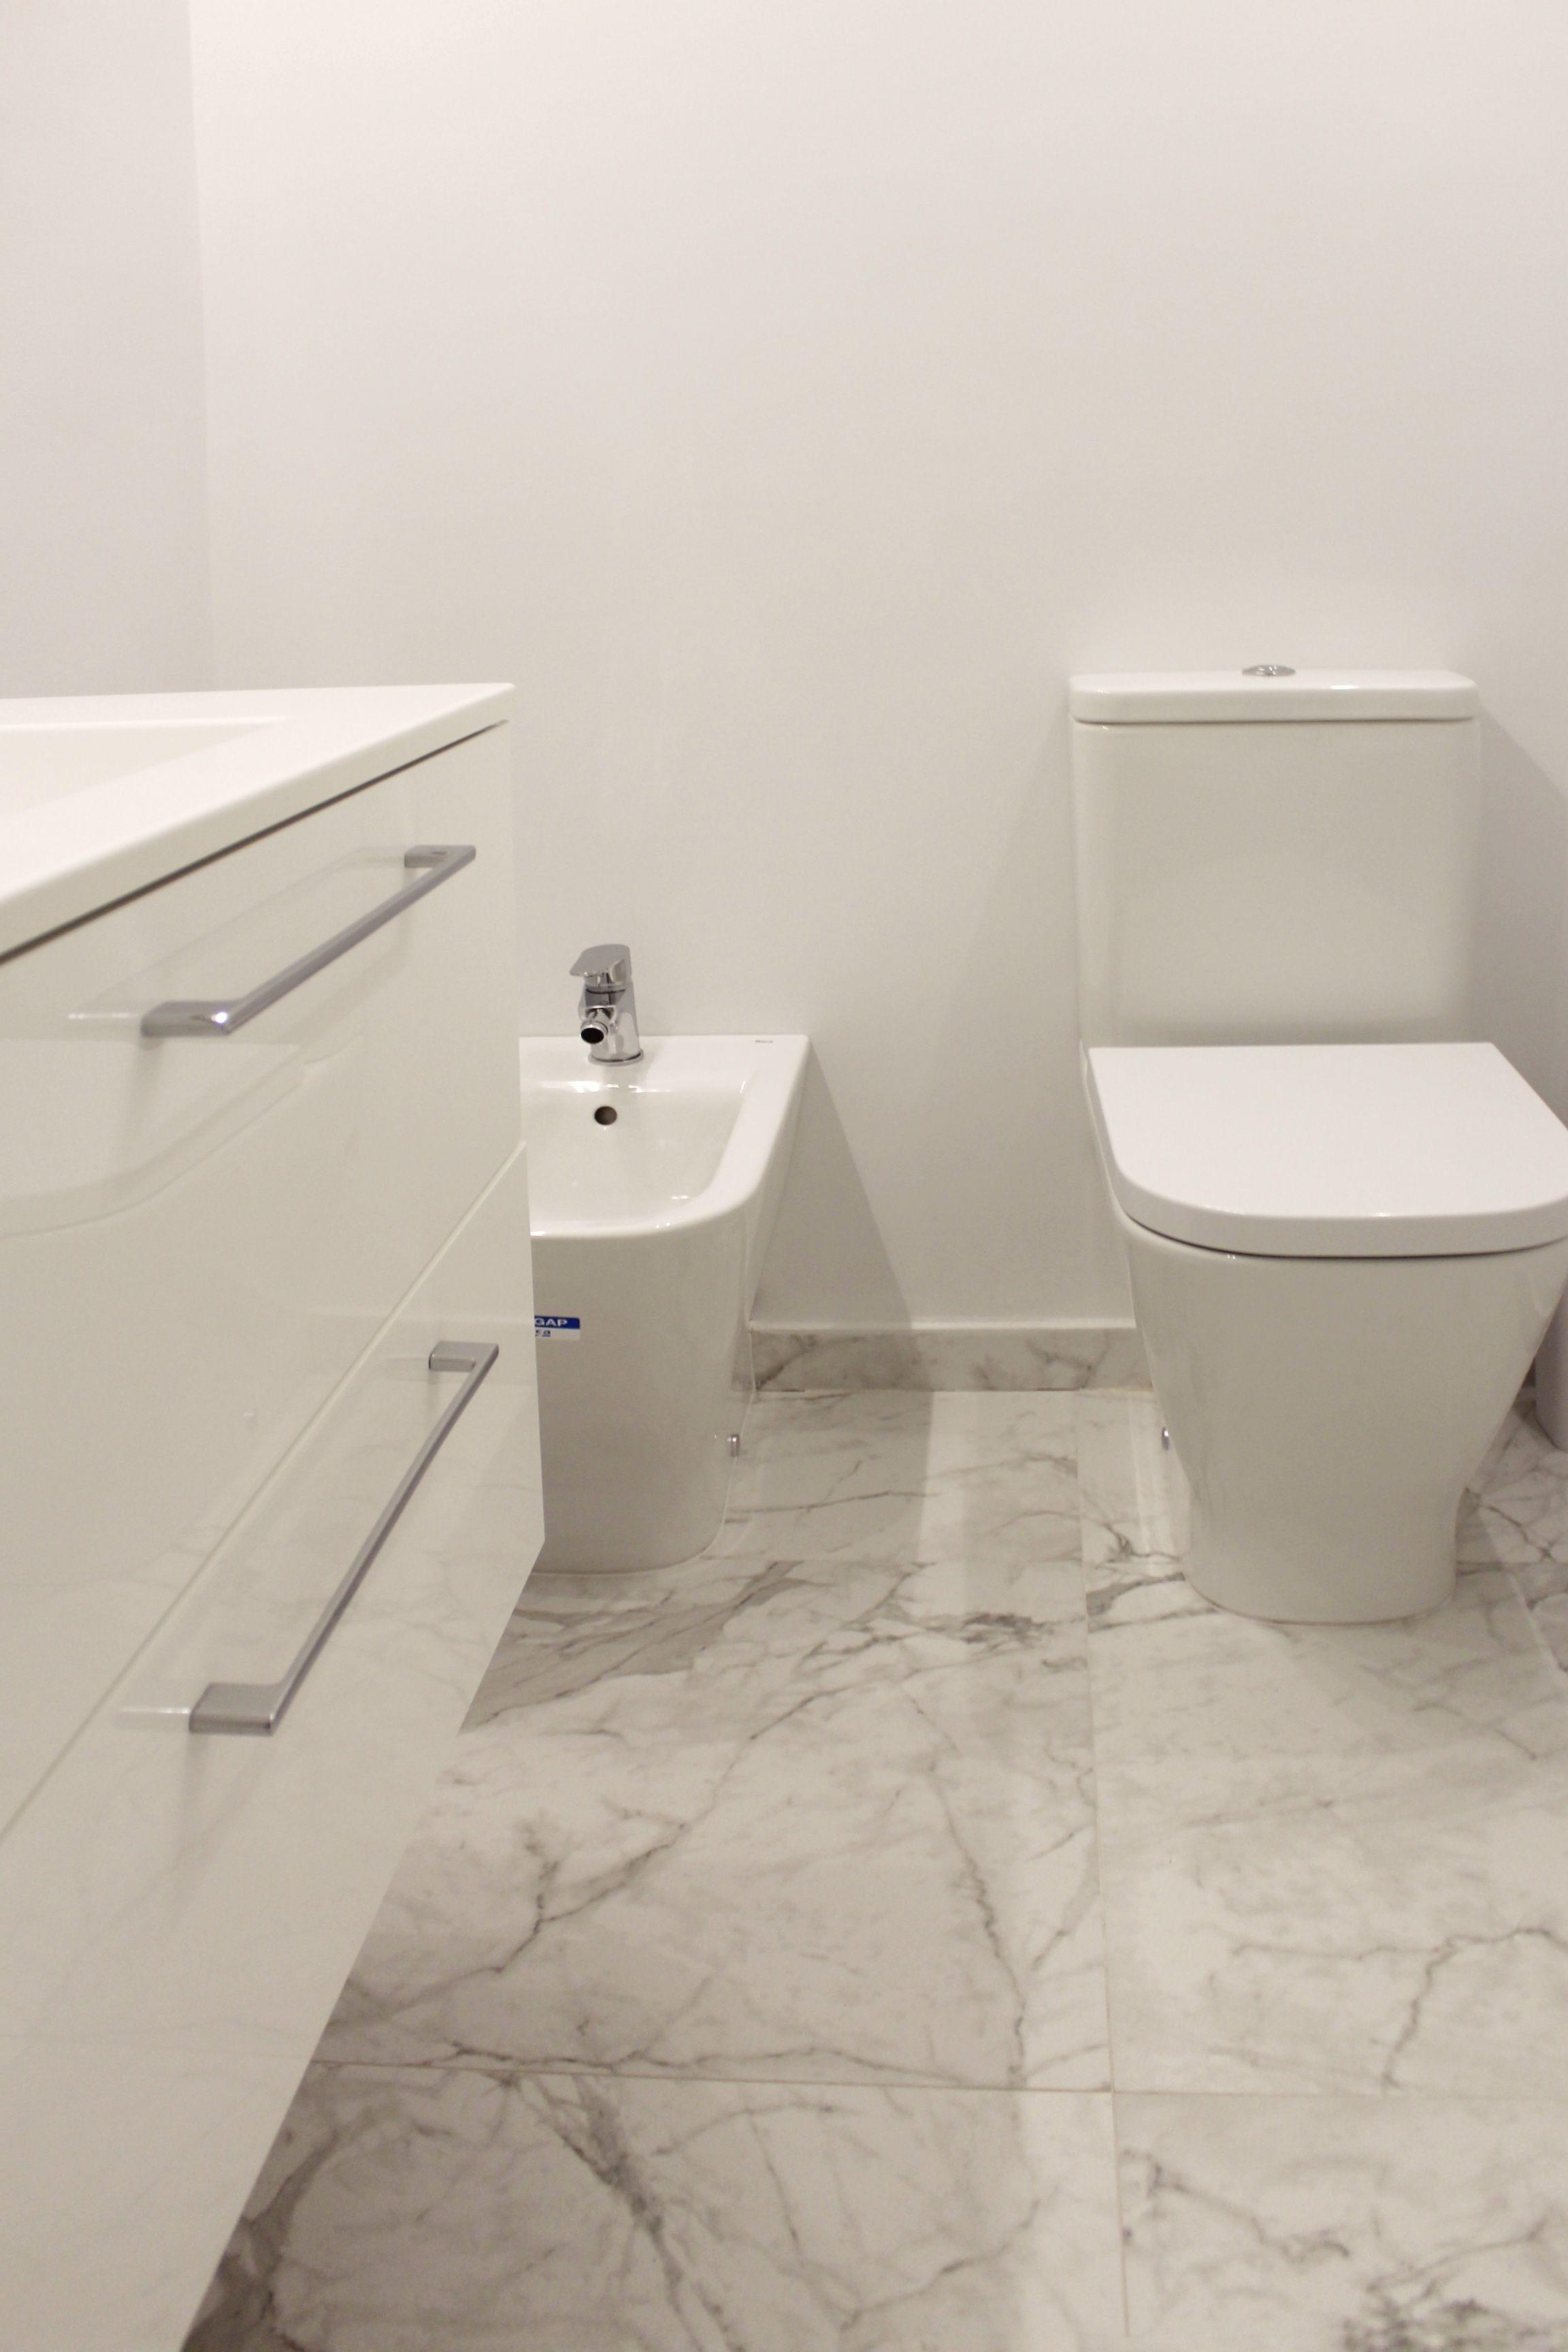 Cuarto de baño | Baños, Cuarto de baño, Cuartos